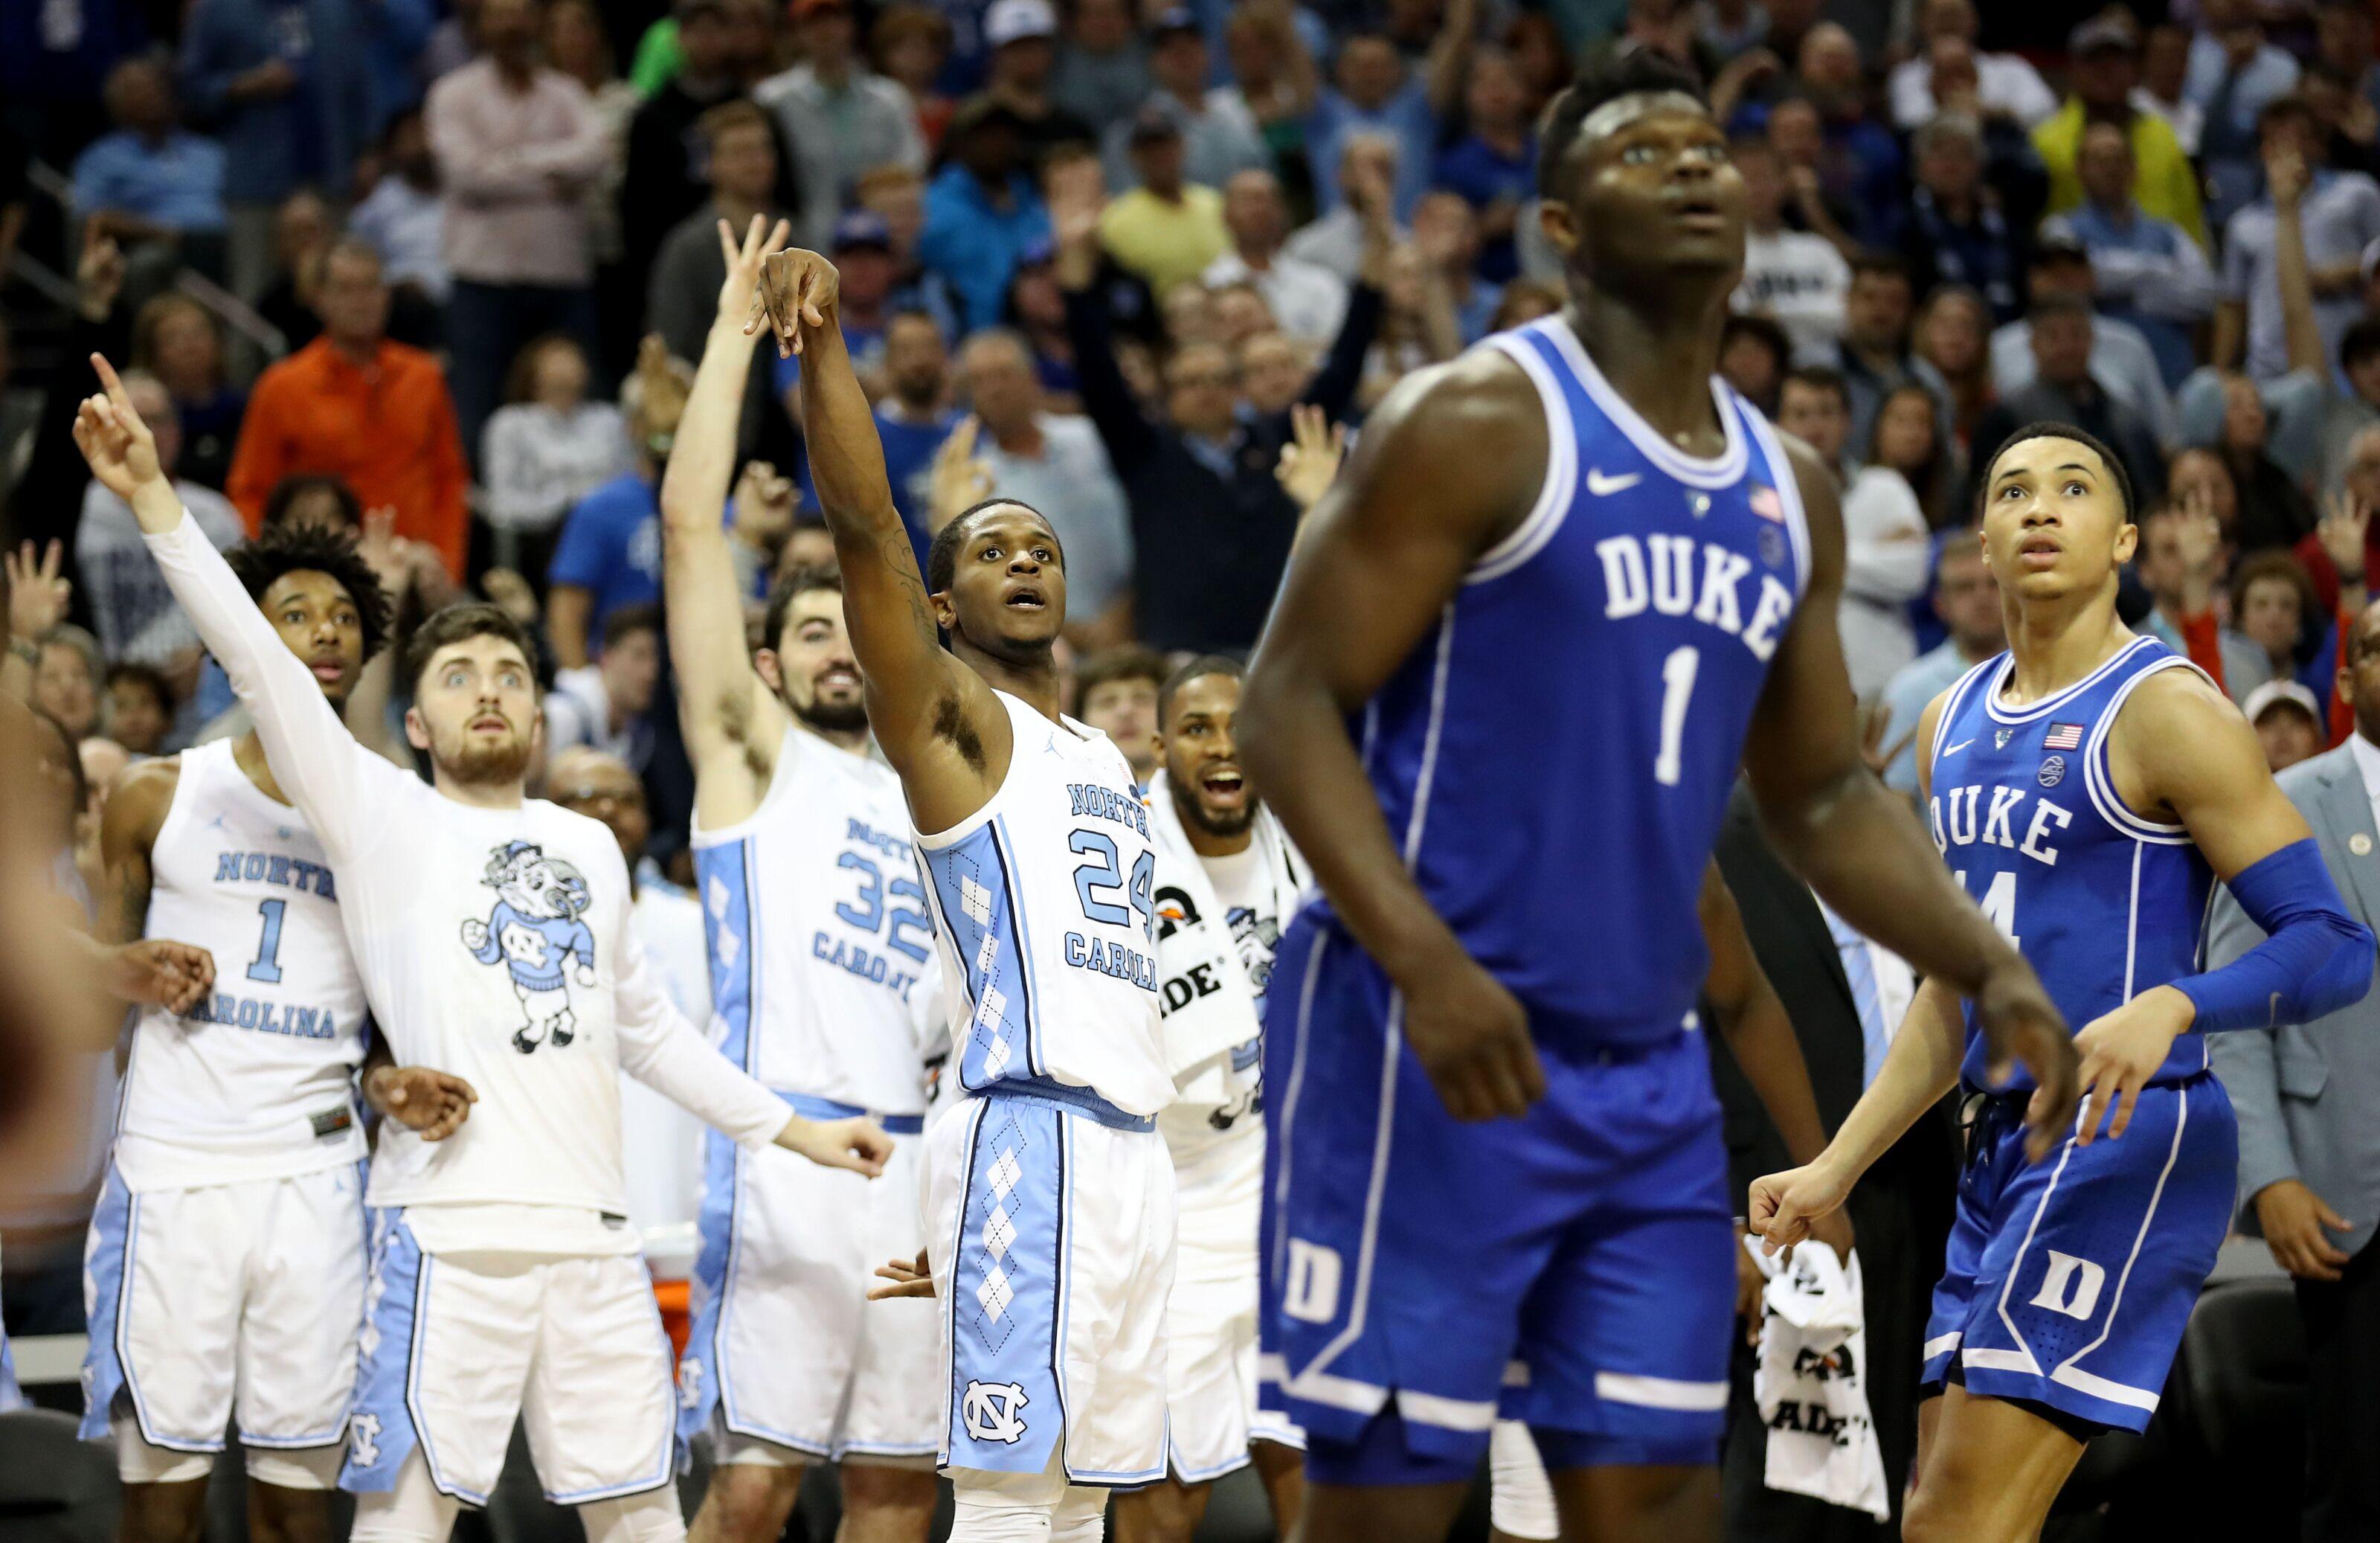 UNC Basketball: Tar Heels lose heartbreaker in ACC semifinal